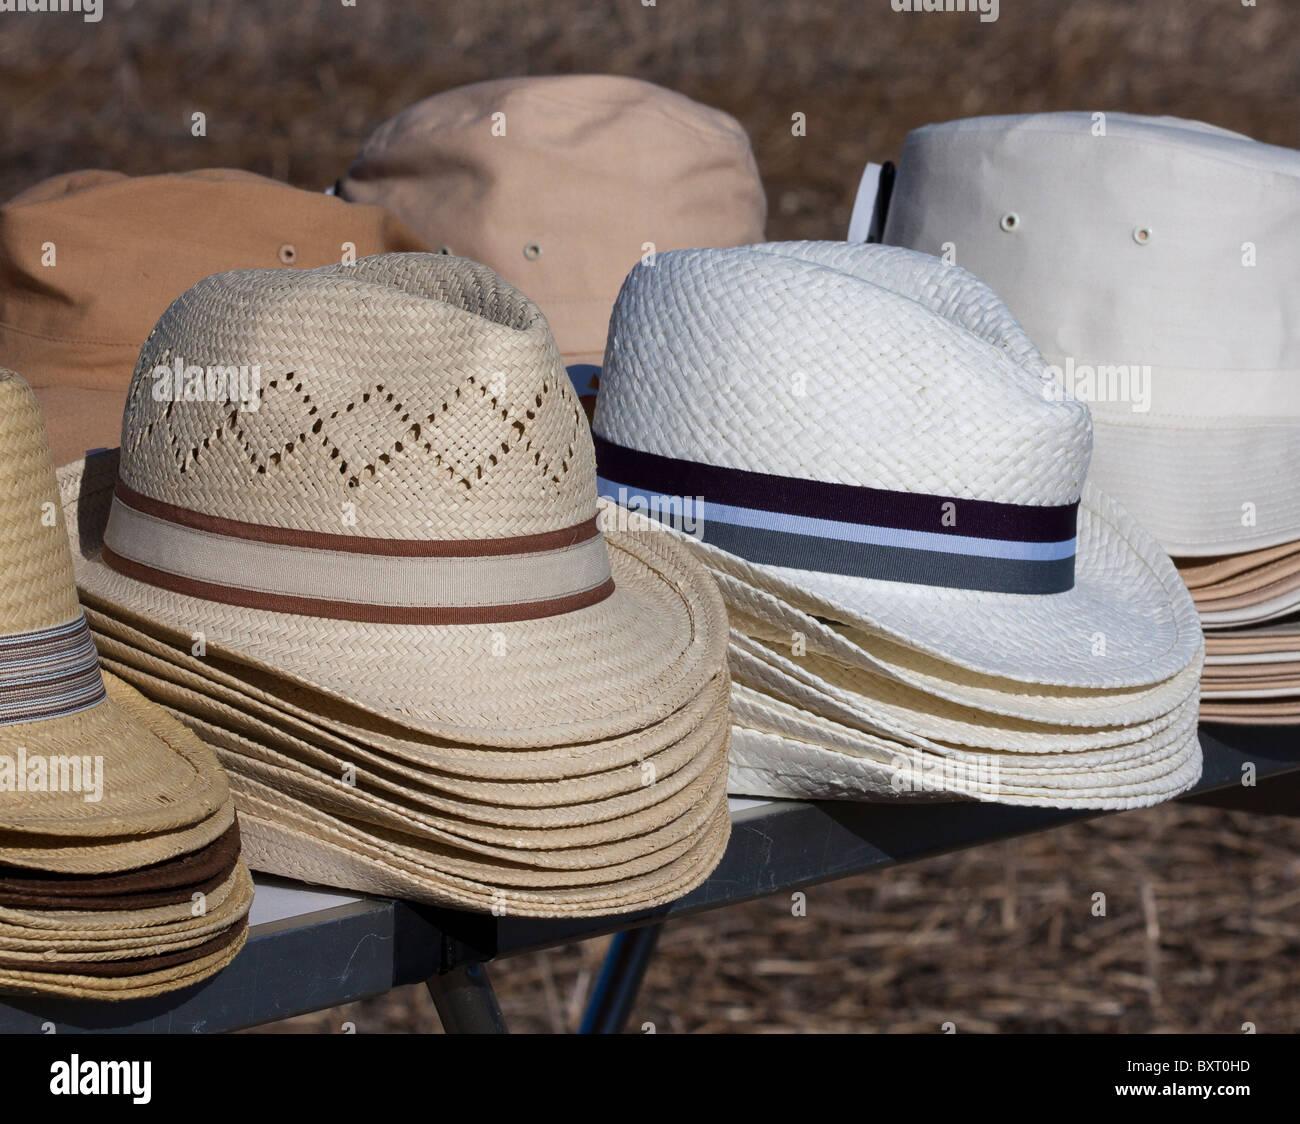 44b28edd475 Sun Hats For Sale Stock Photos   Sun Hats For Sale Stock Images ...